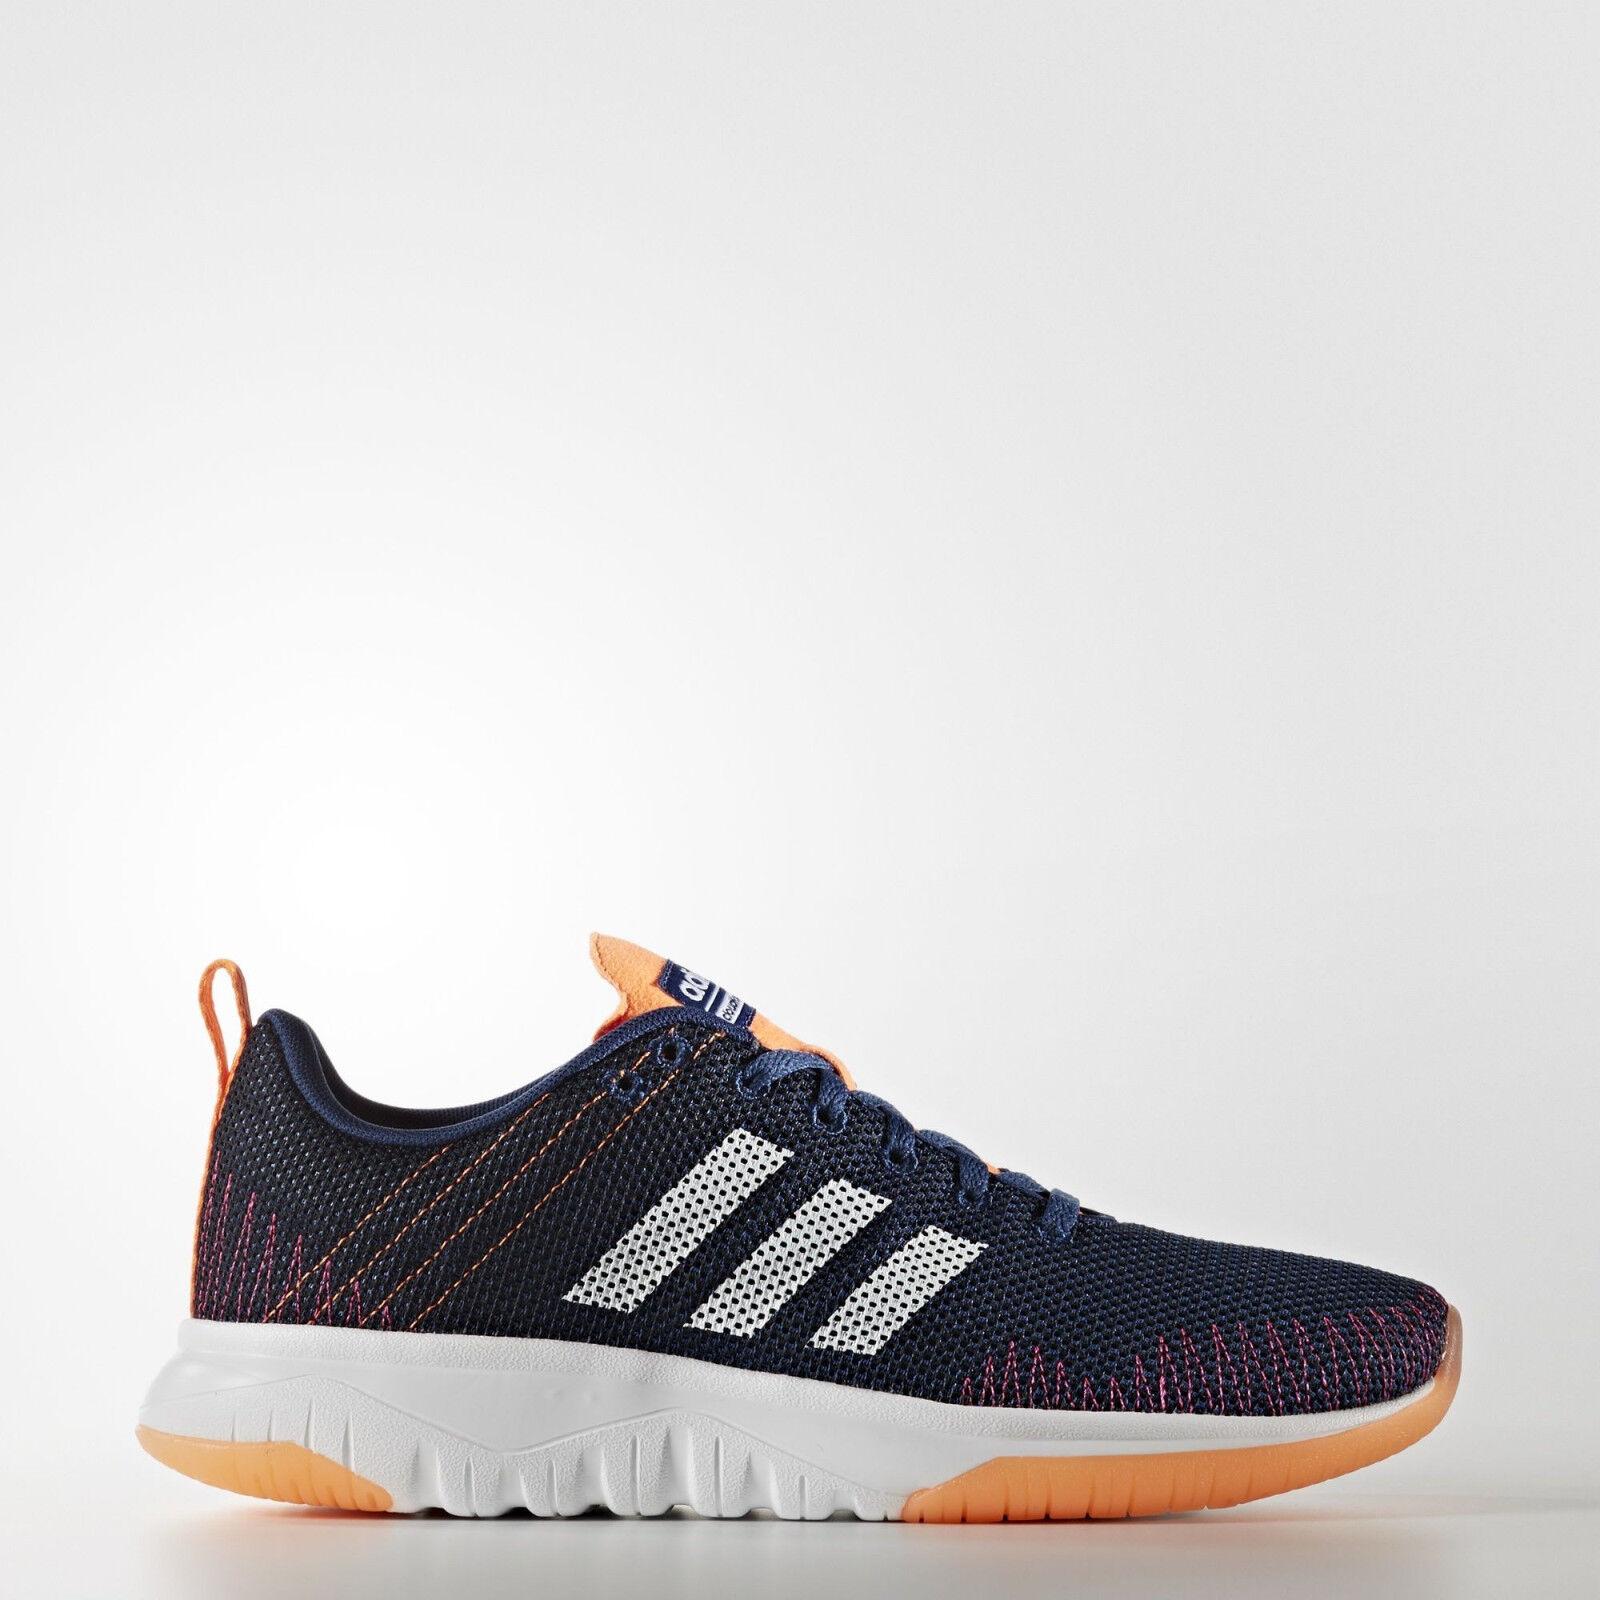 Adidas Neo Damens Cloudfoam Super Flex traniers :